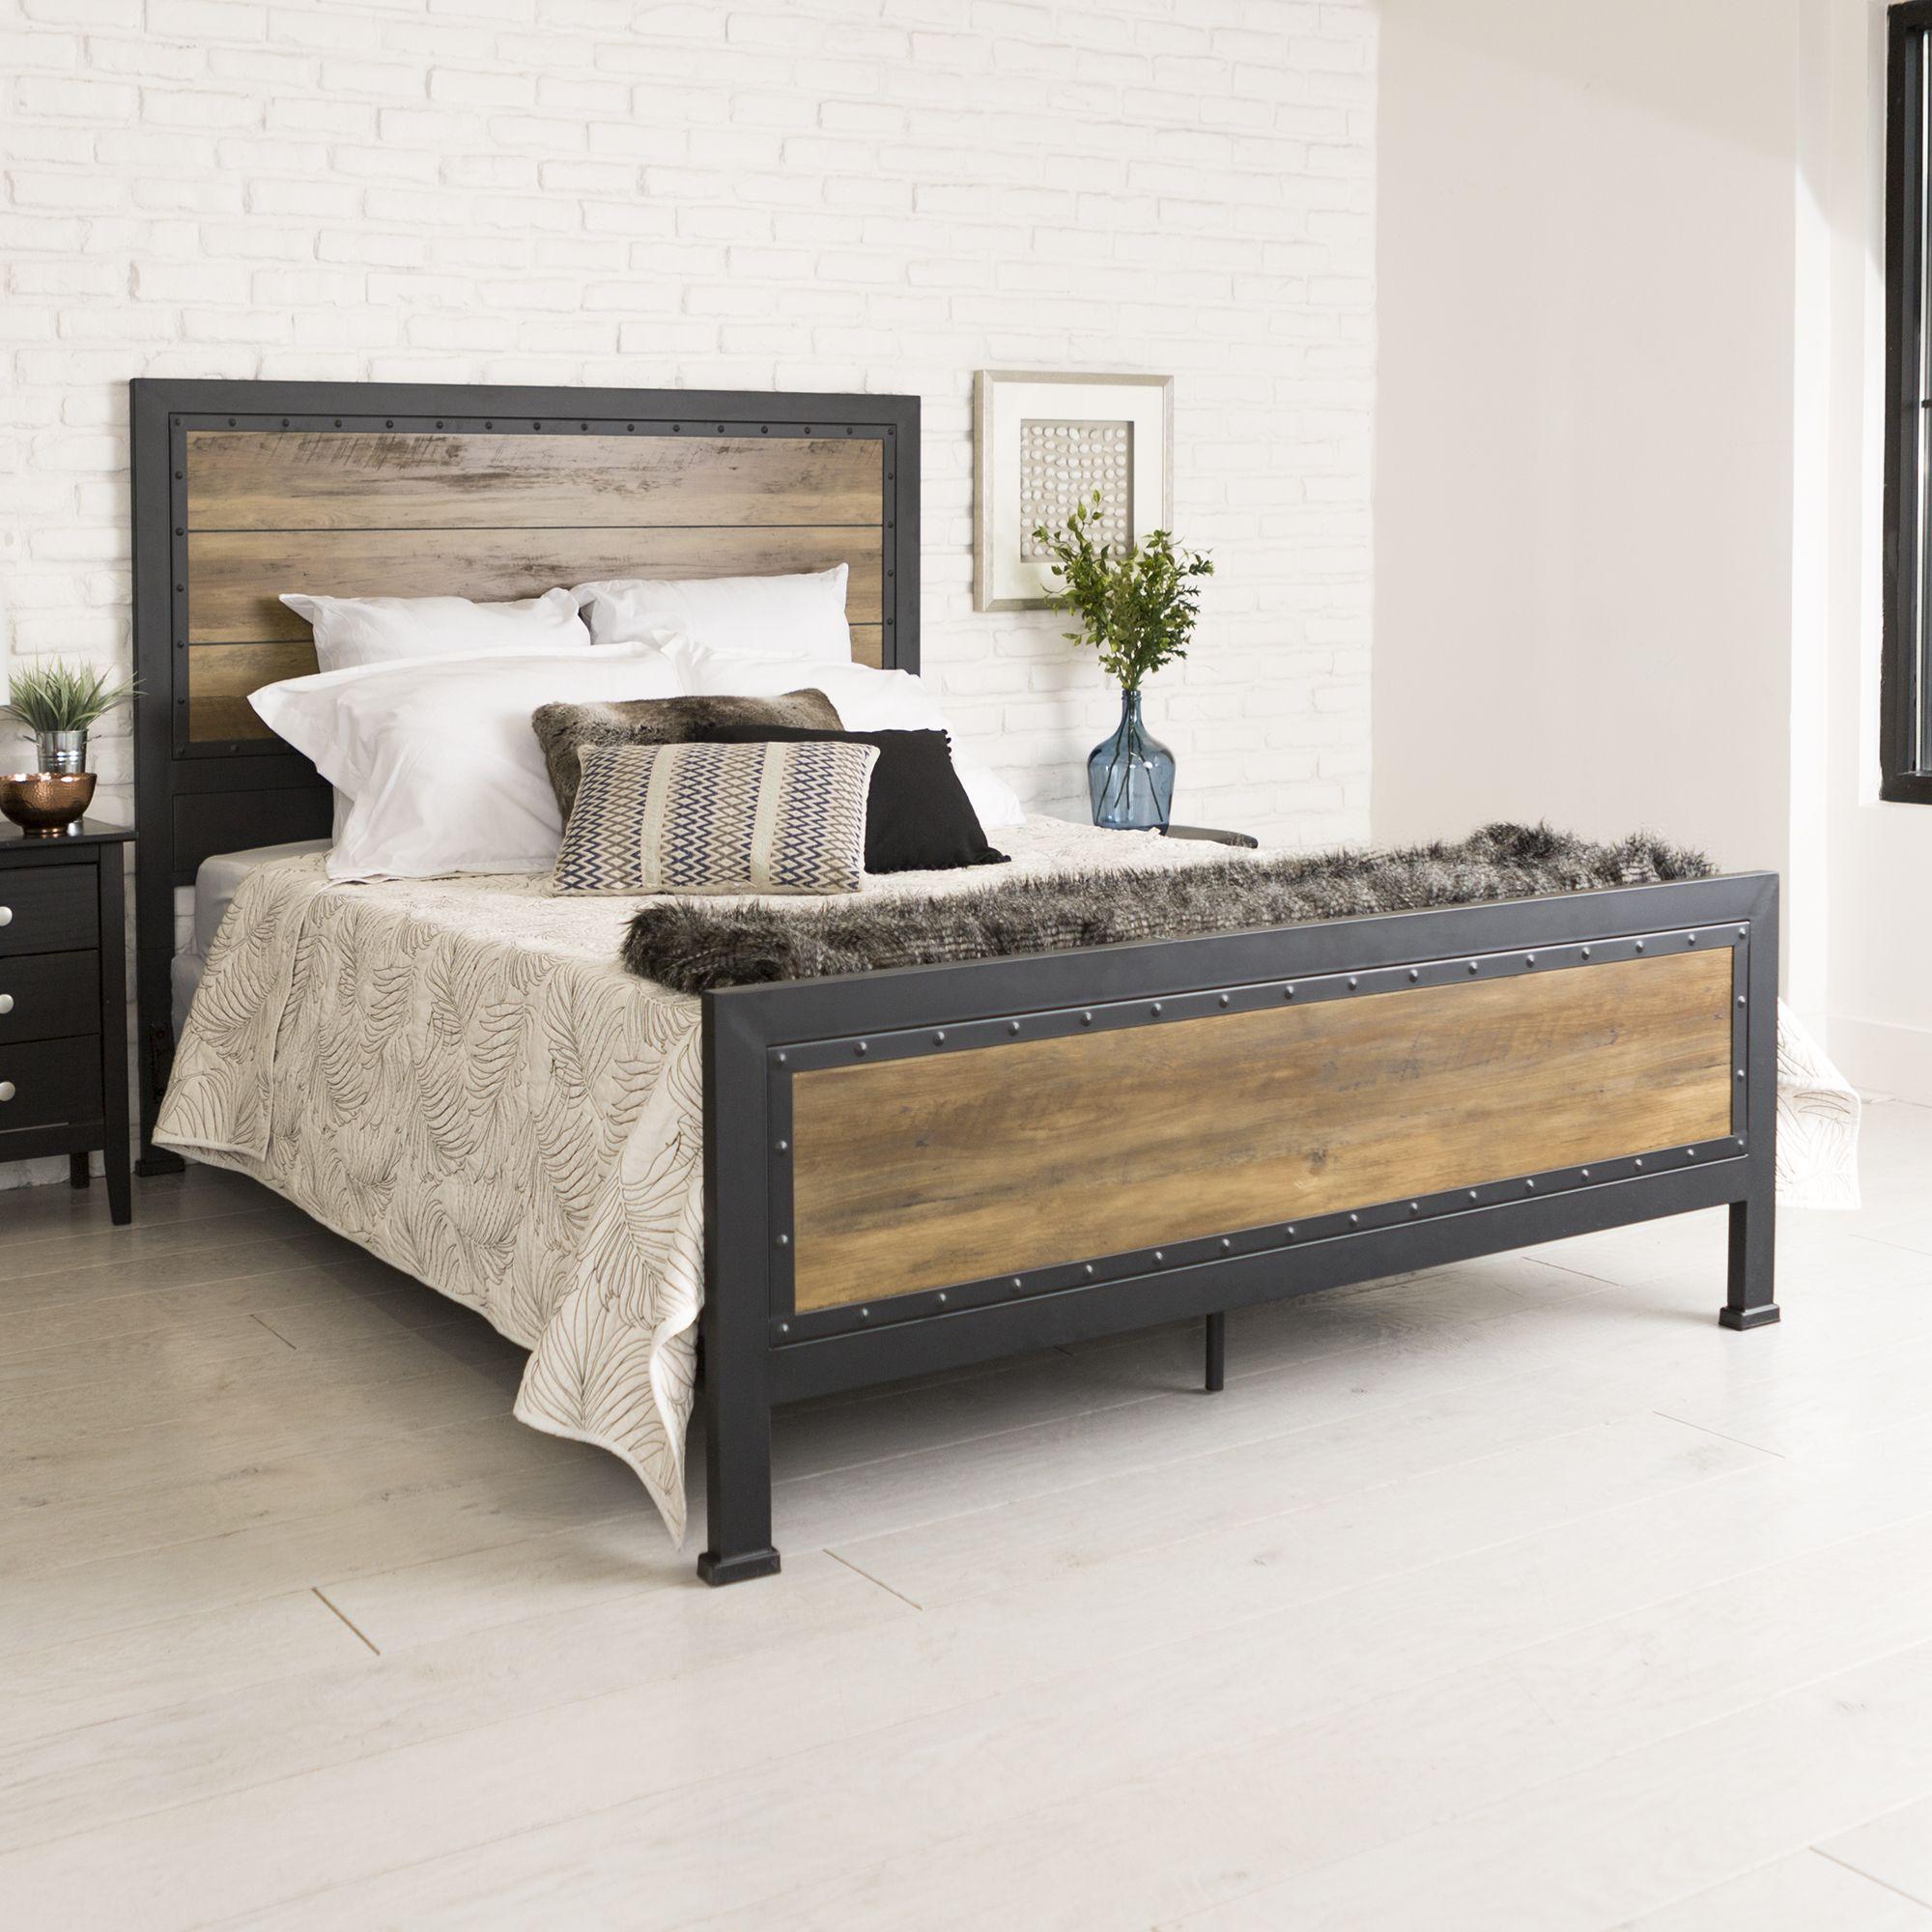 Home Rustic Bedroom Furniture Bed Furniture Rustic Bedding